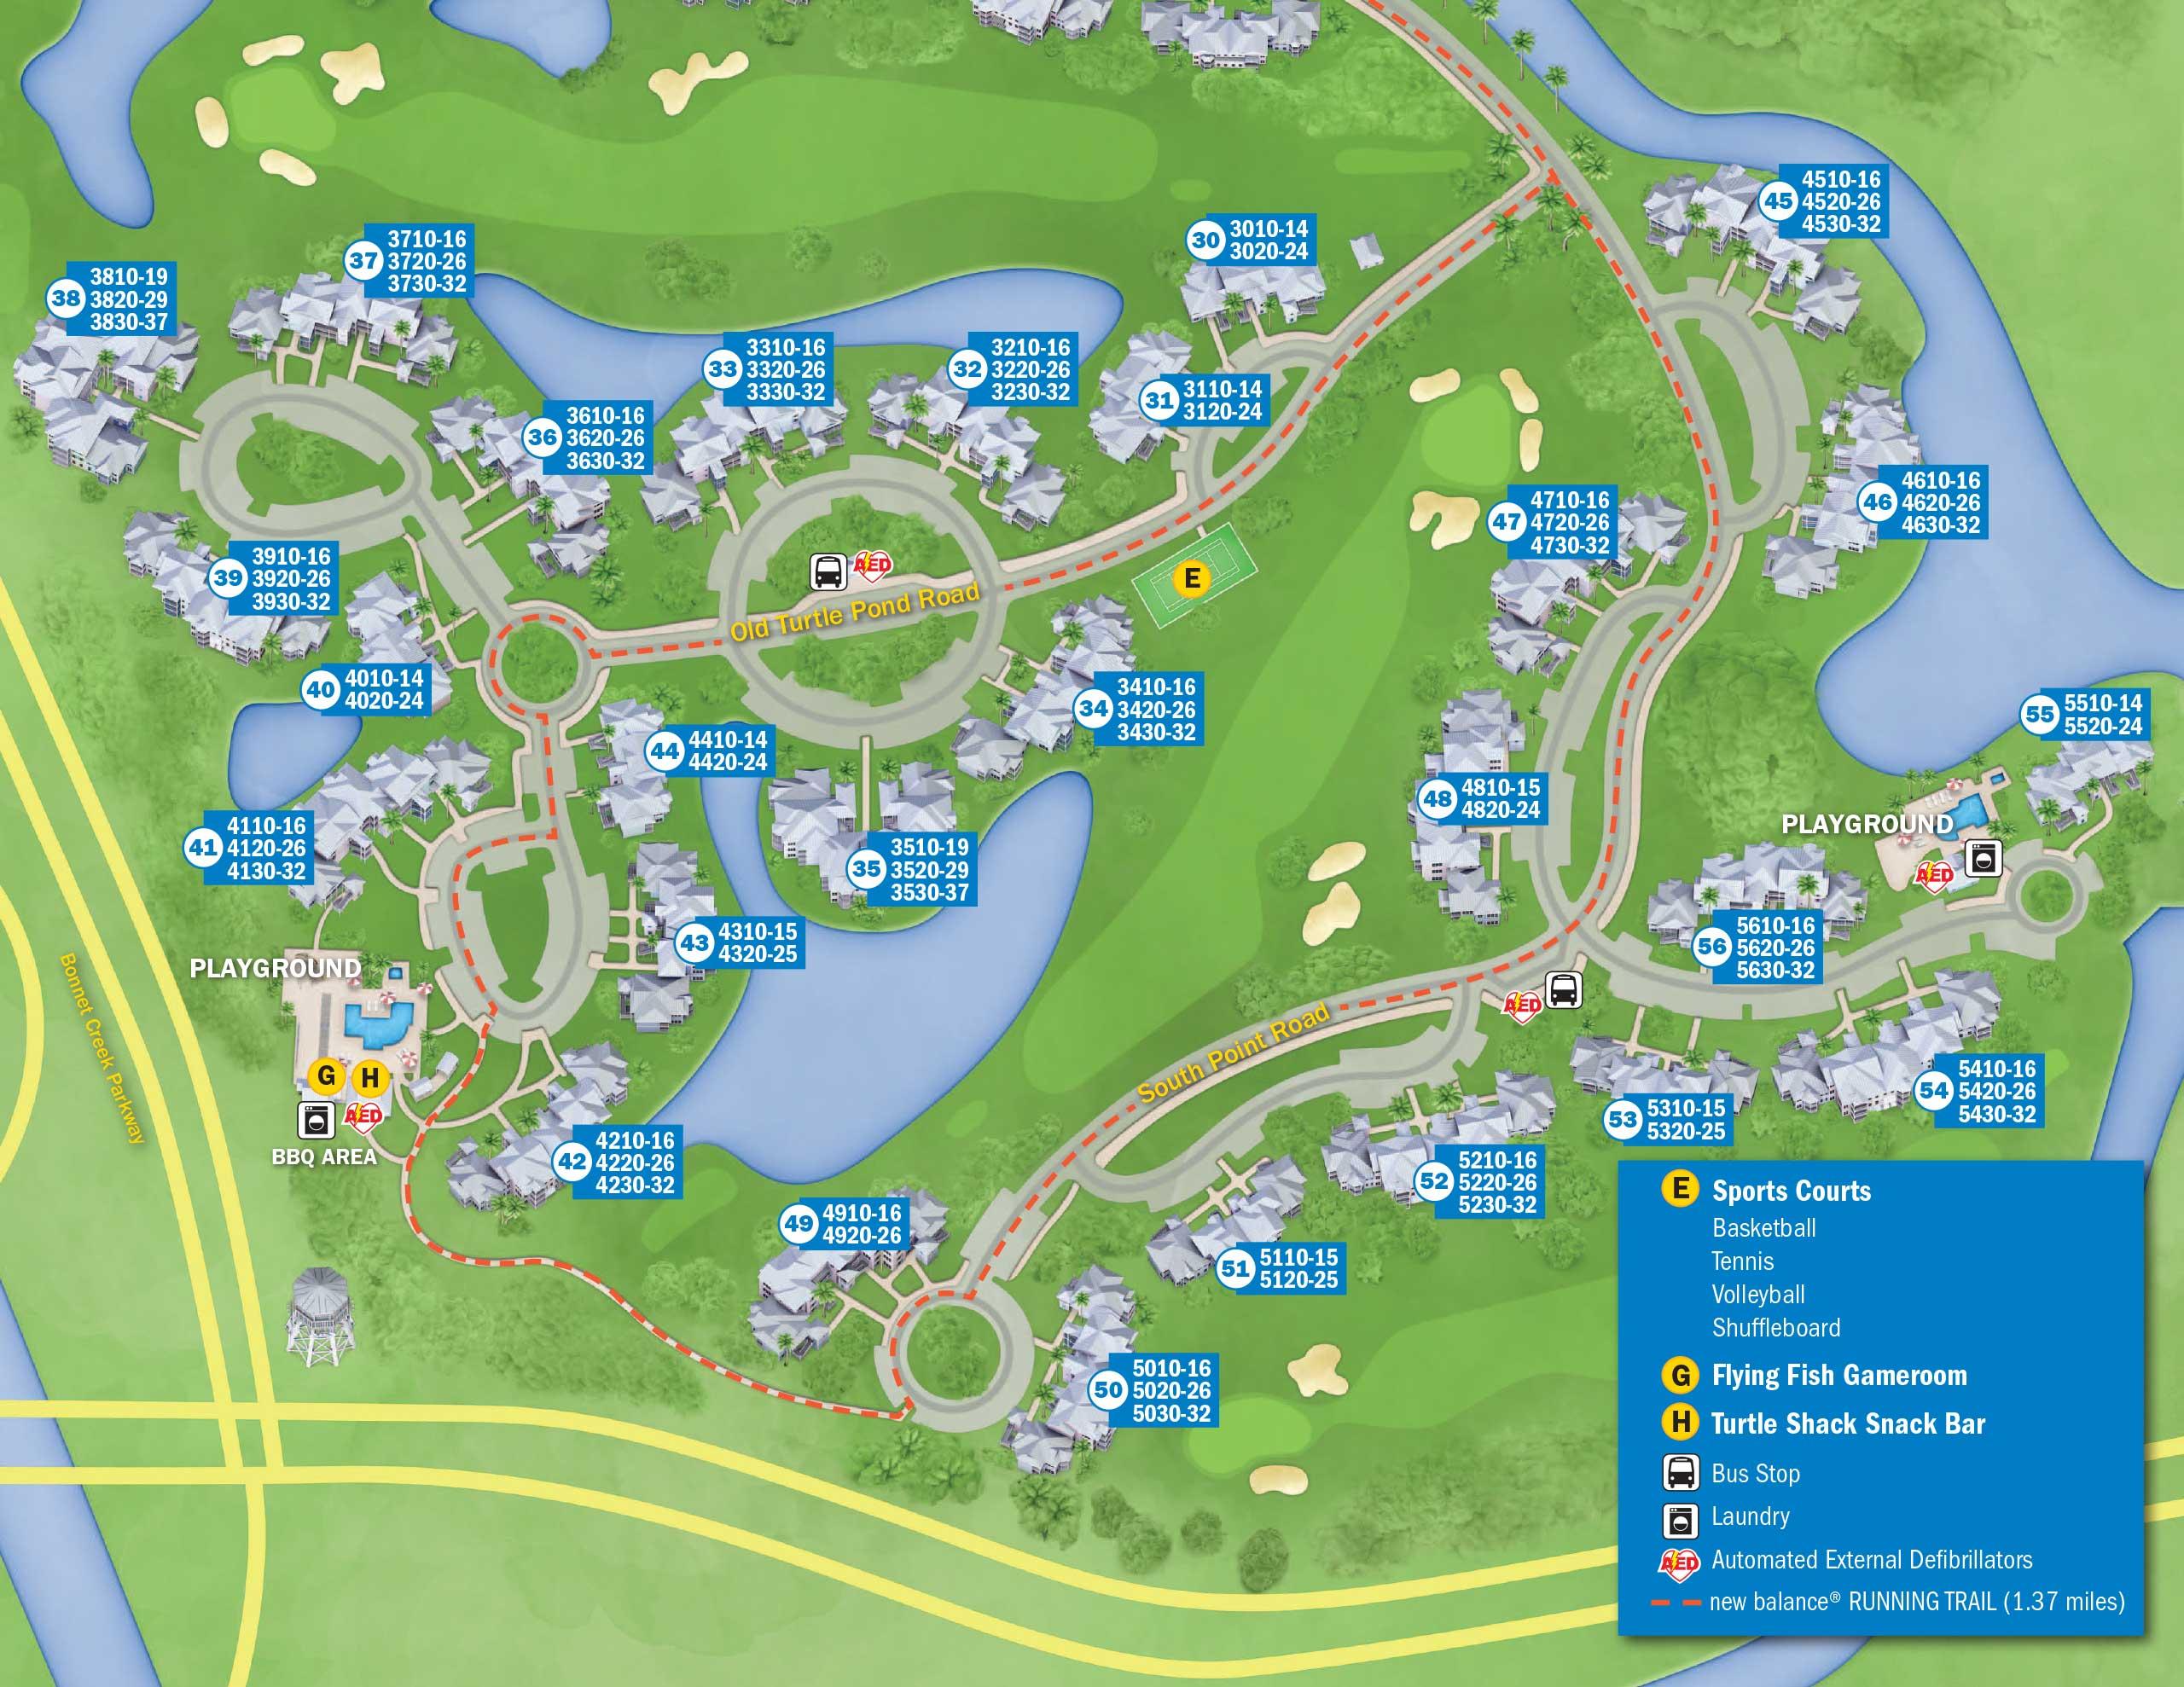 April 2017 Walt Disney World Resort Hotel Maps - Photo 28 of 33